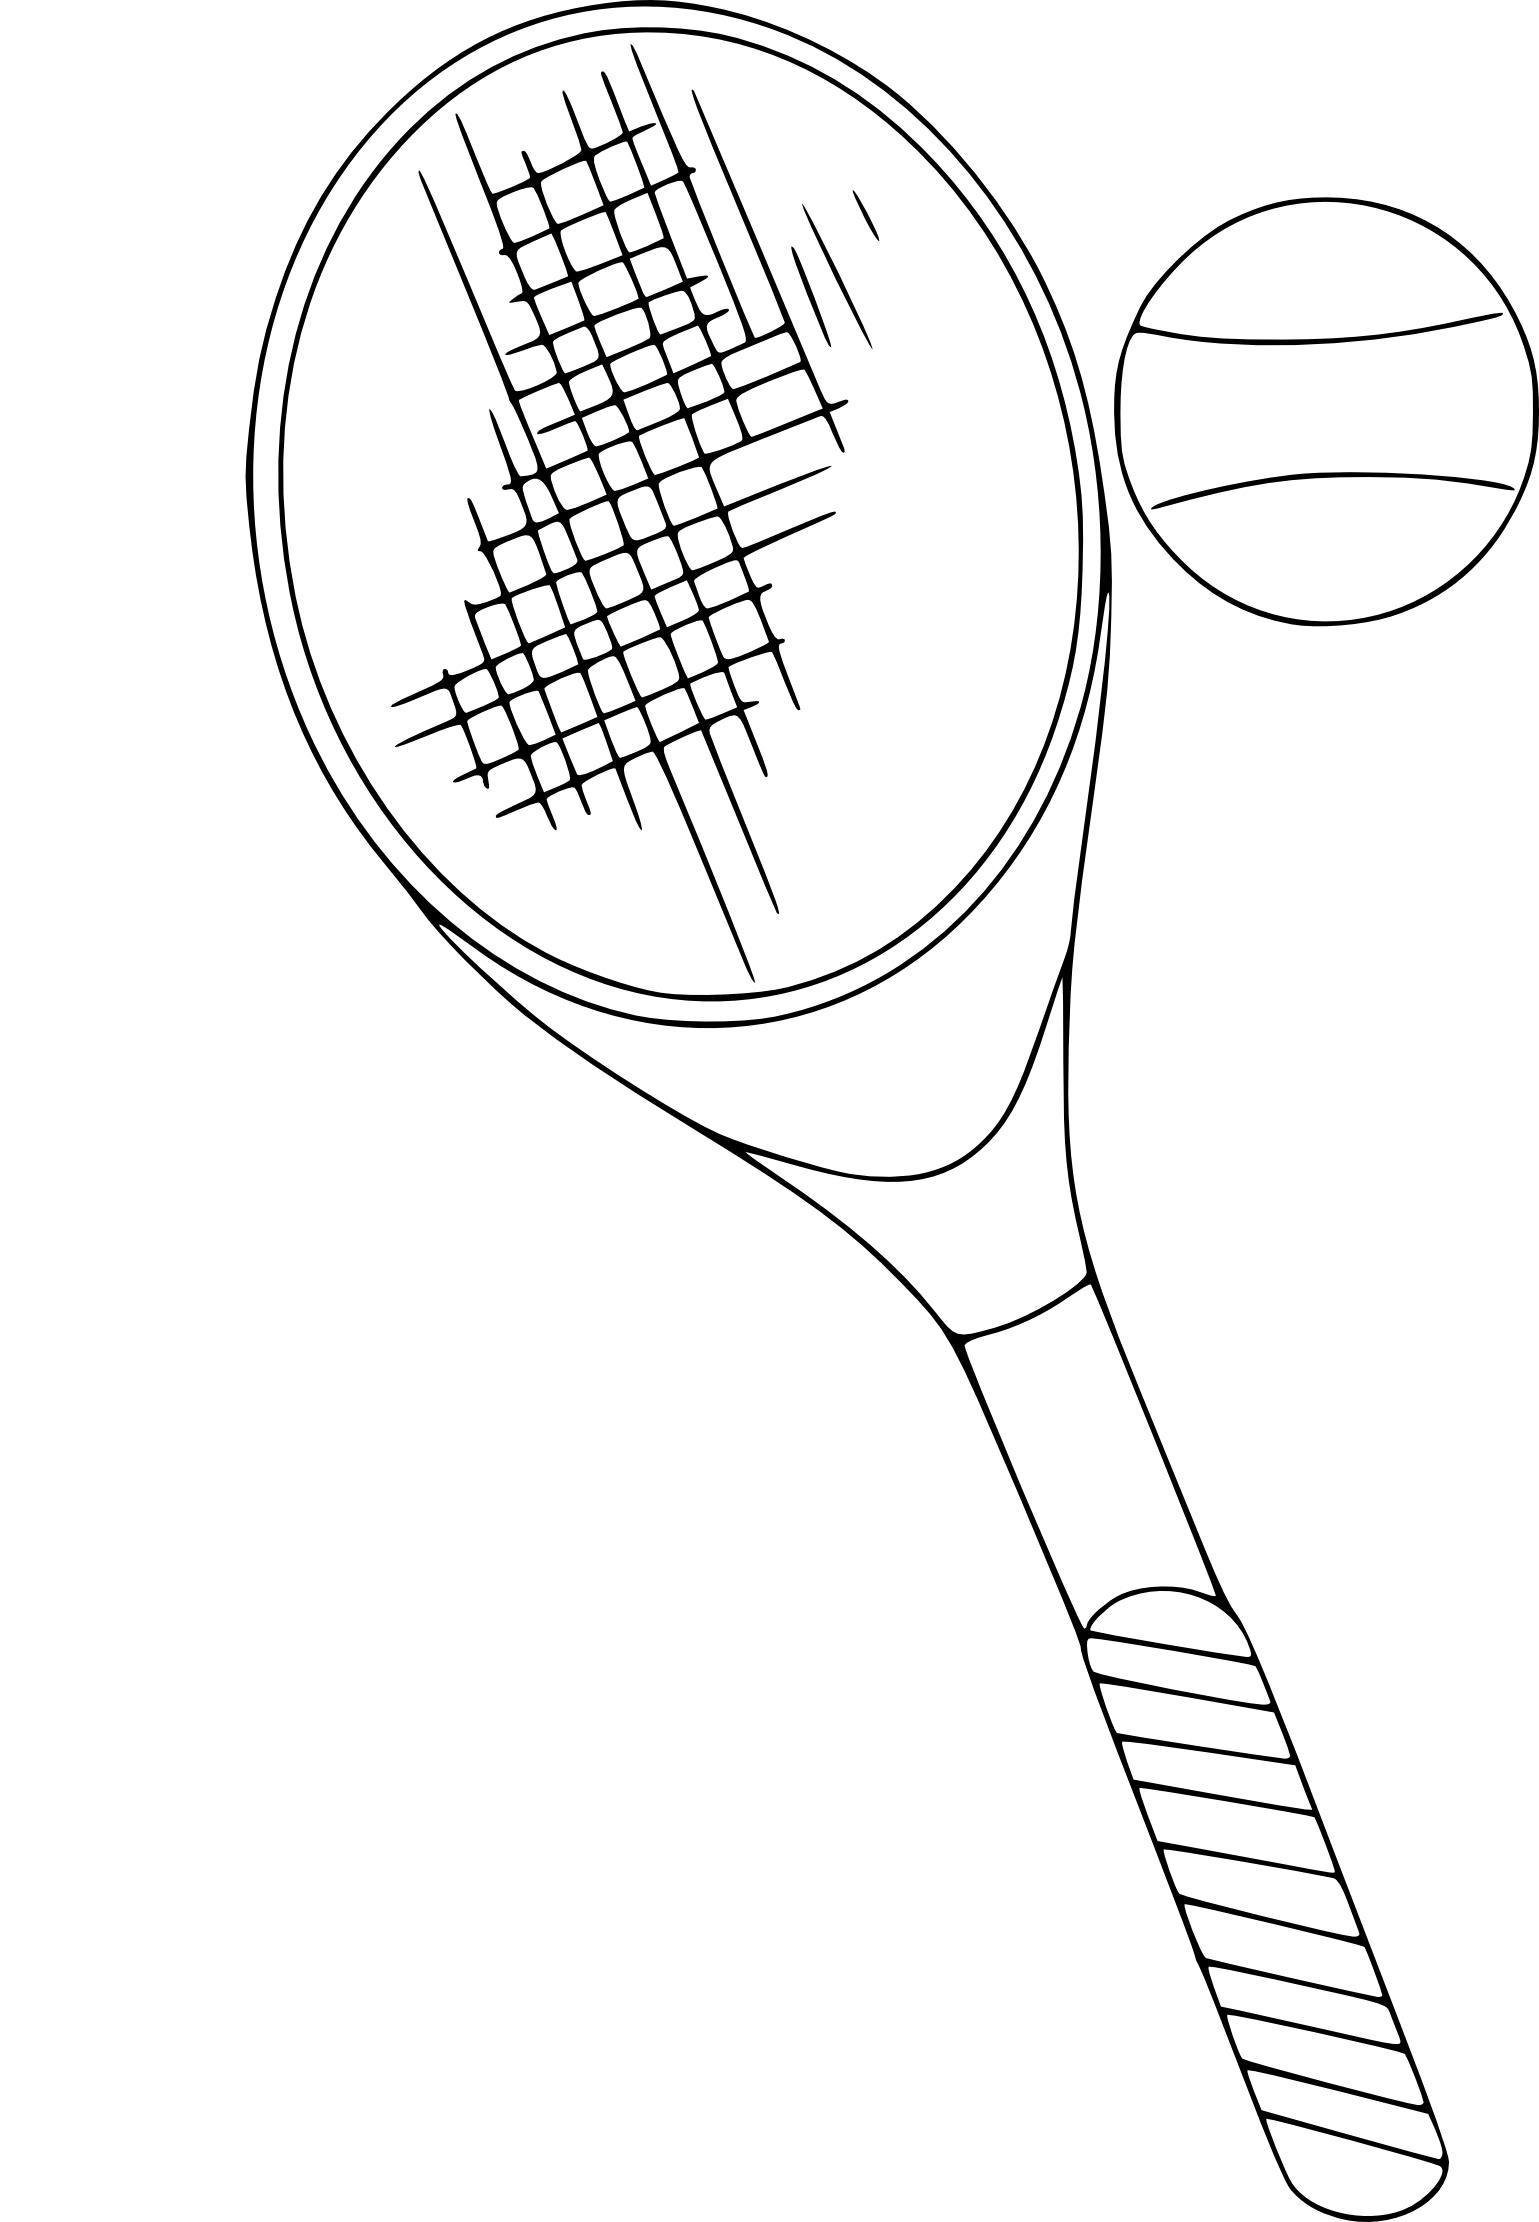 Coloriage raquette de tennis